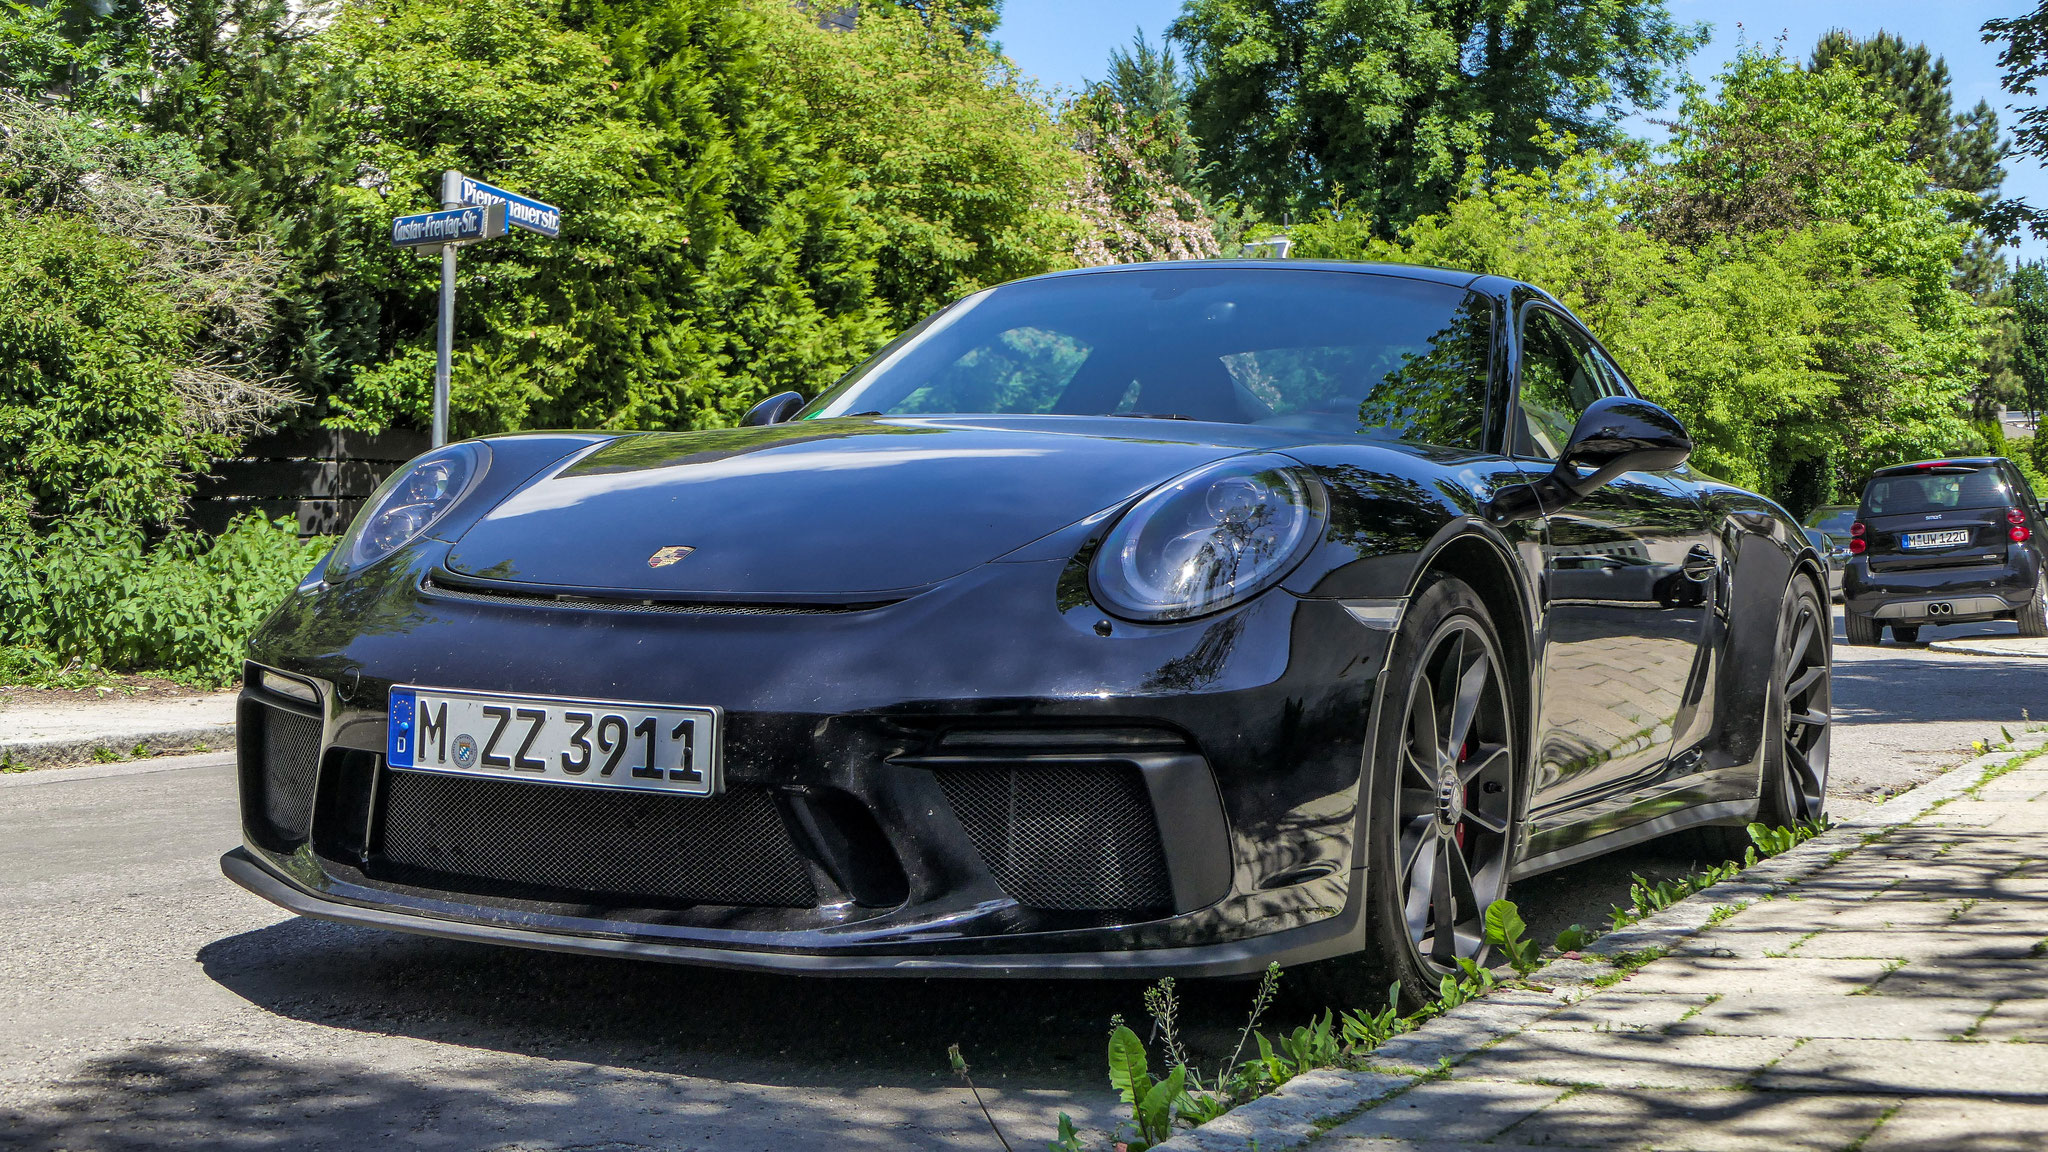 Porsche 991 GT3 Touring Package - M-ZZ-3911